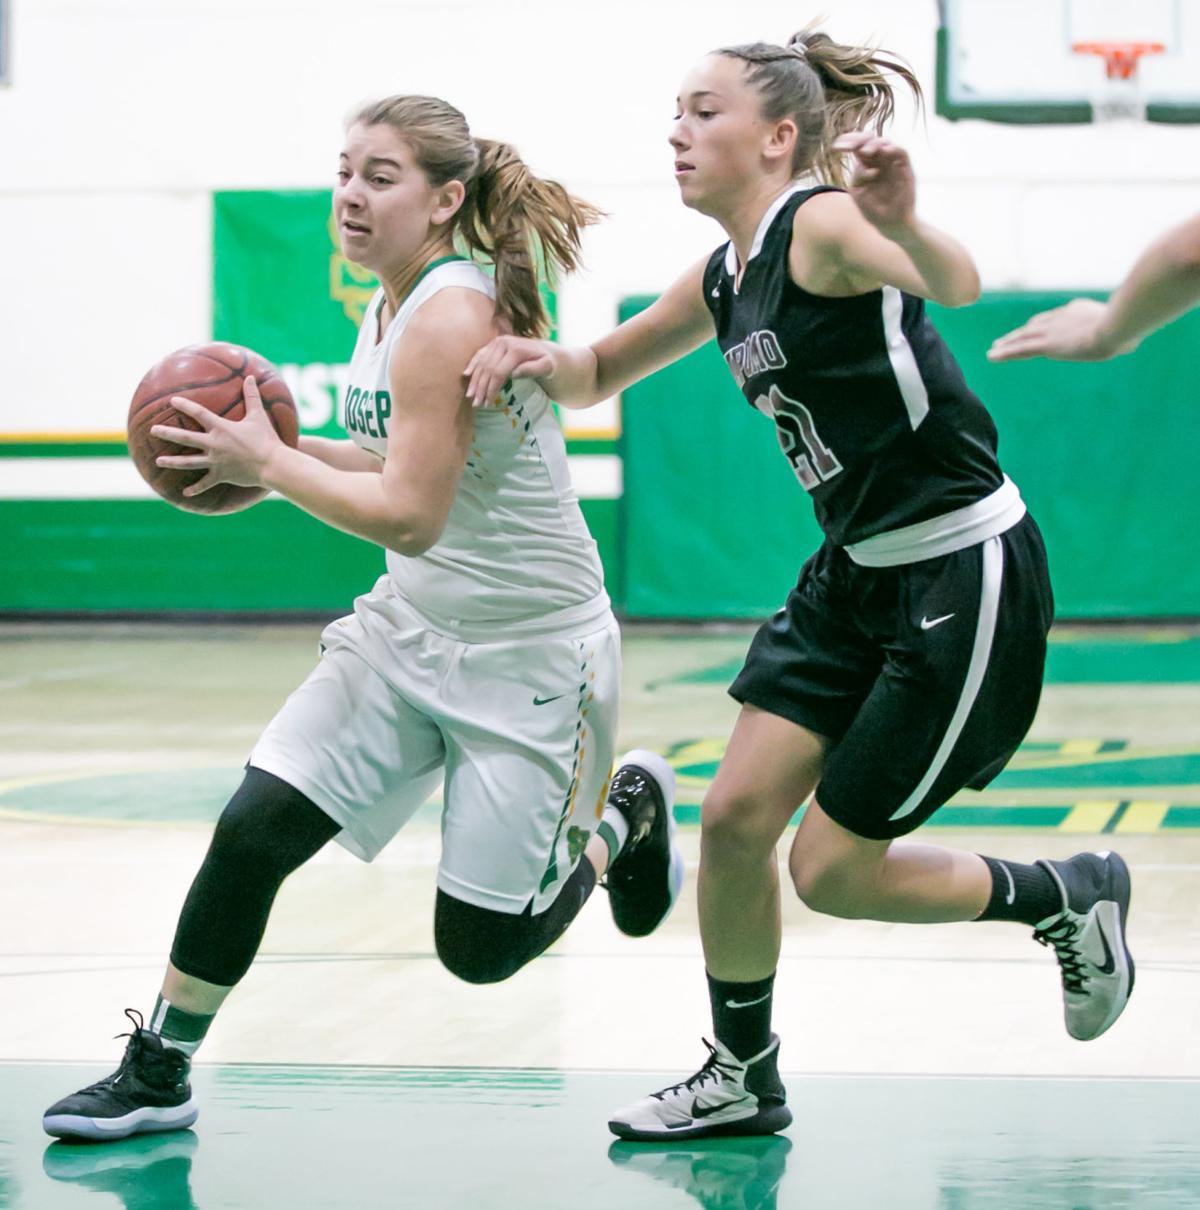 122117 St. Joes Nipomo Girls Basketball 006.jpg